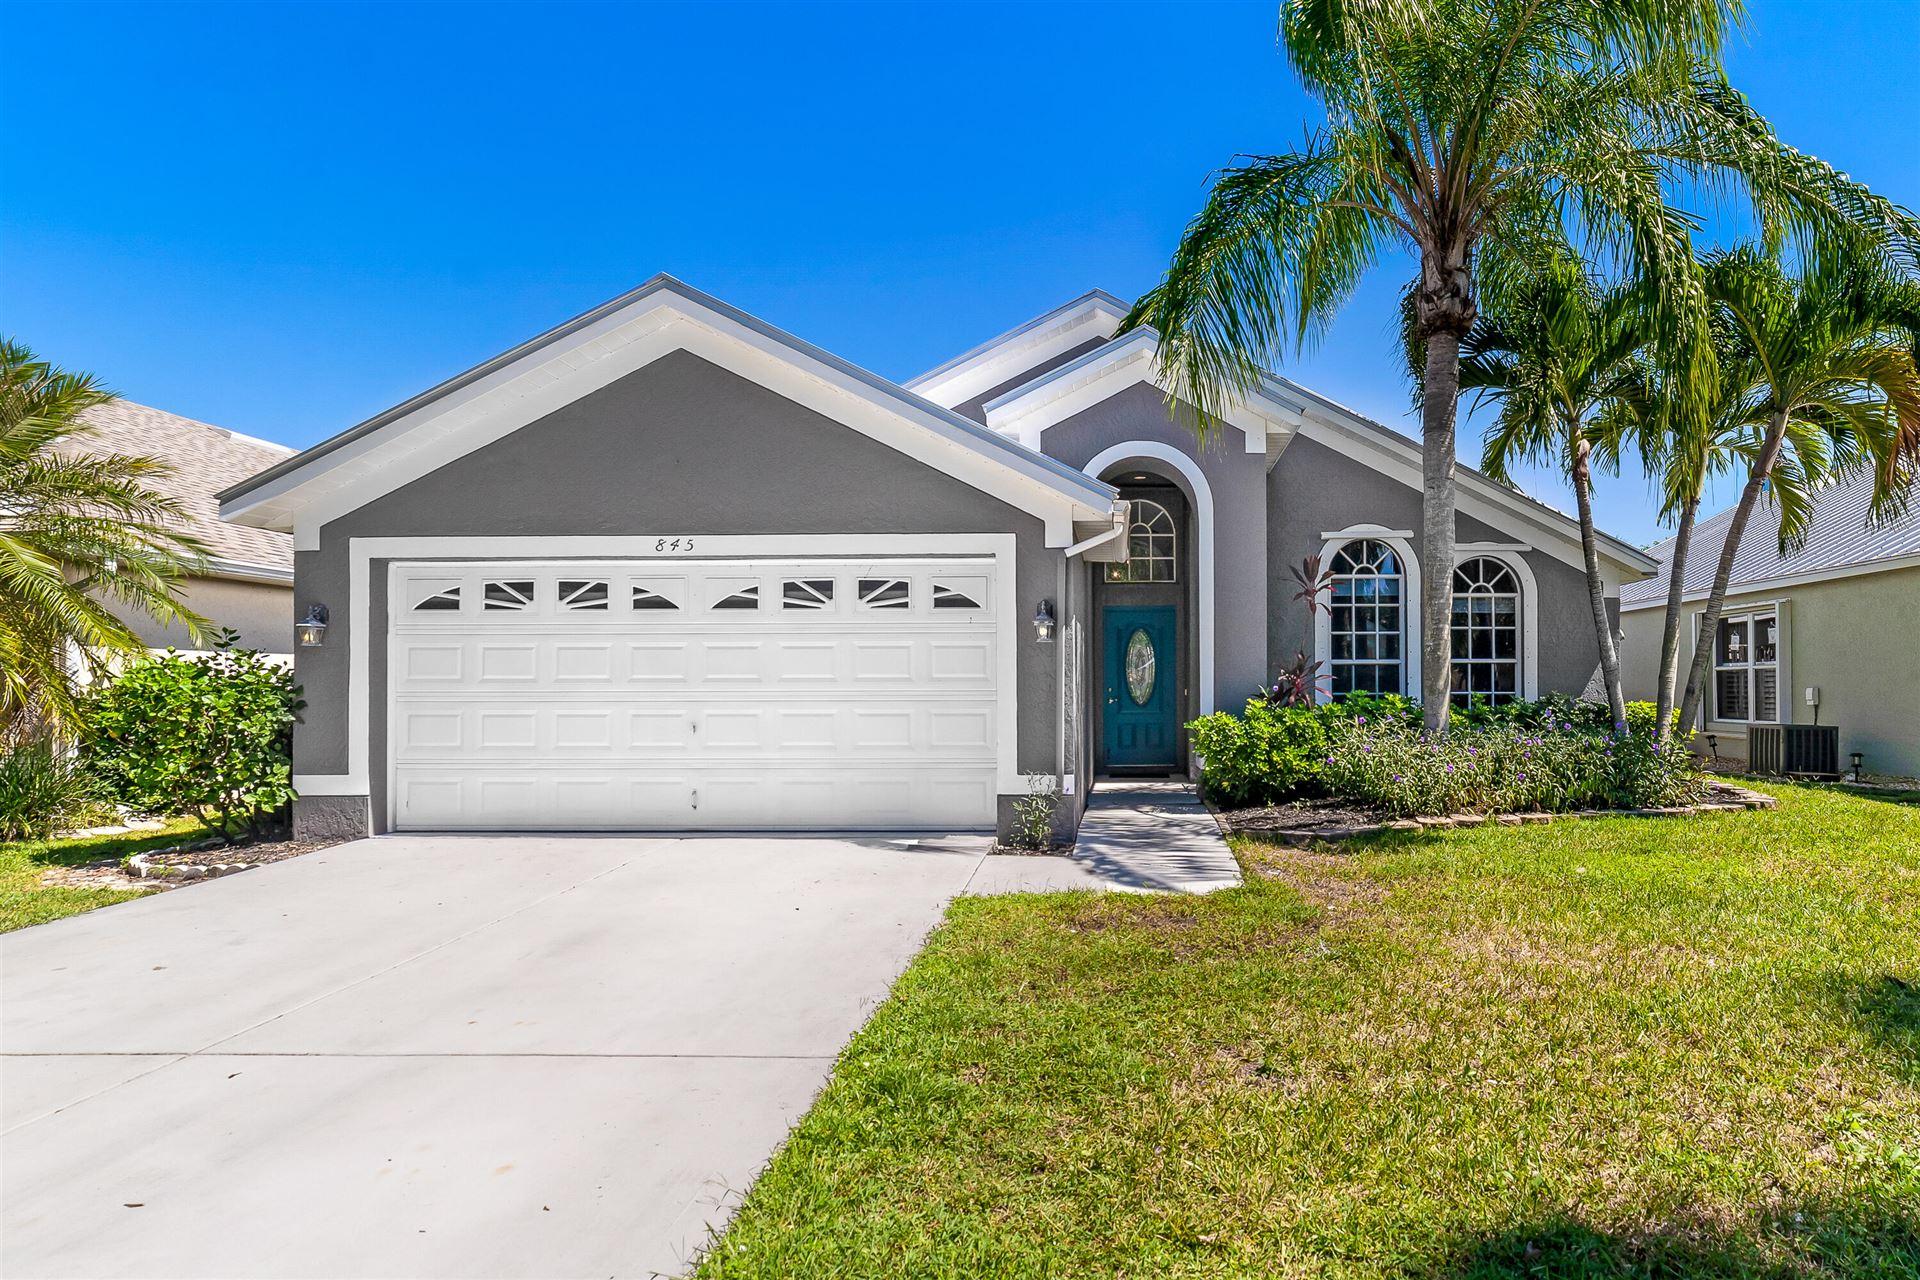 845 NW Waterlily Place, Jensen Beach, FL 34957 - MLS#: RX-10748597